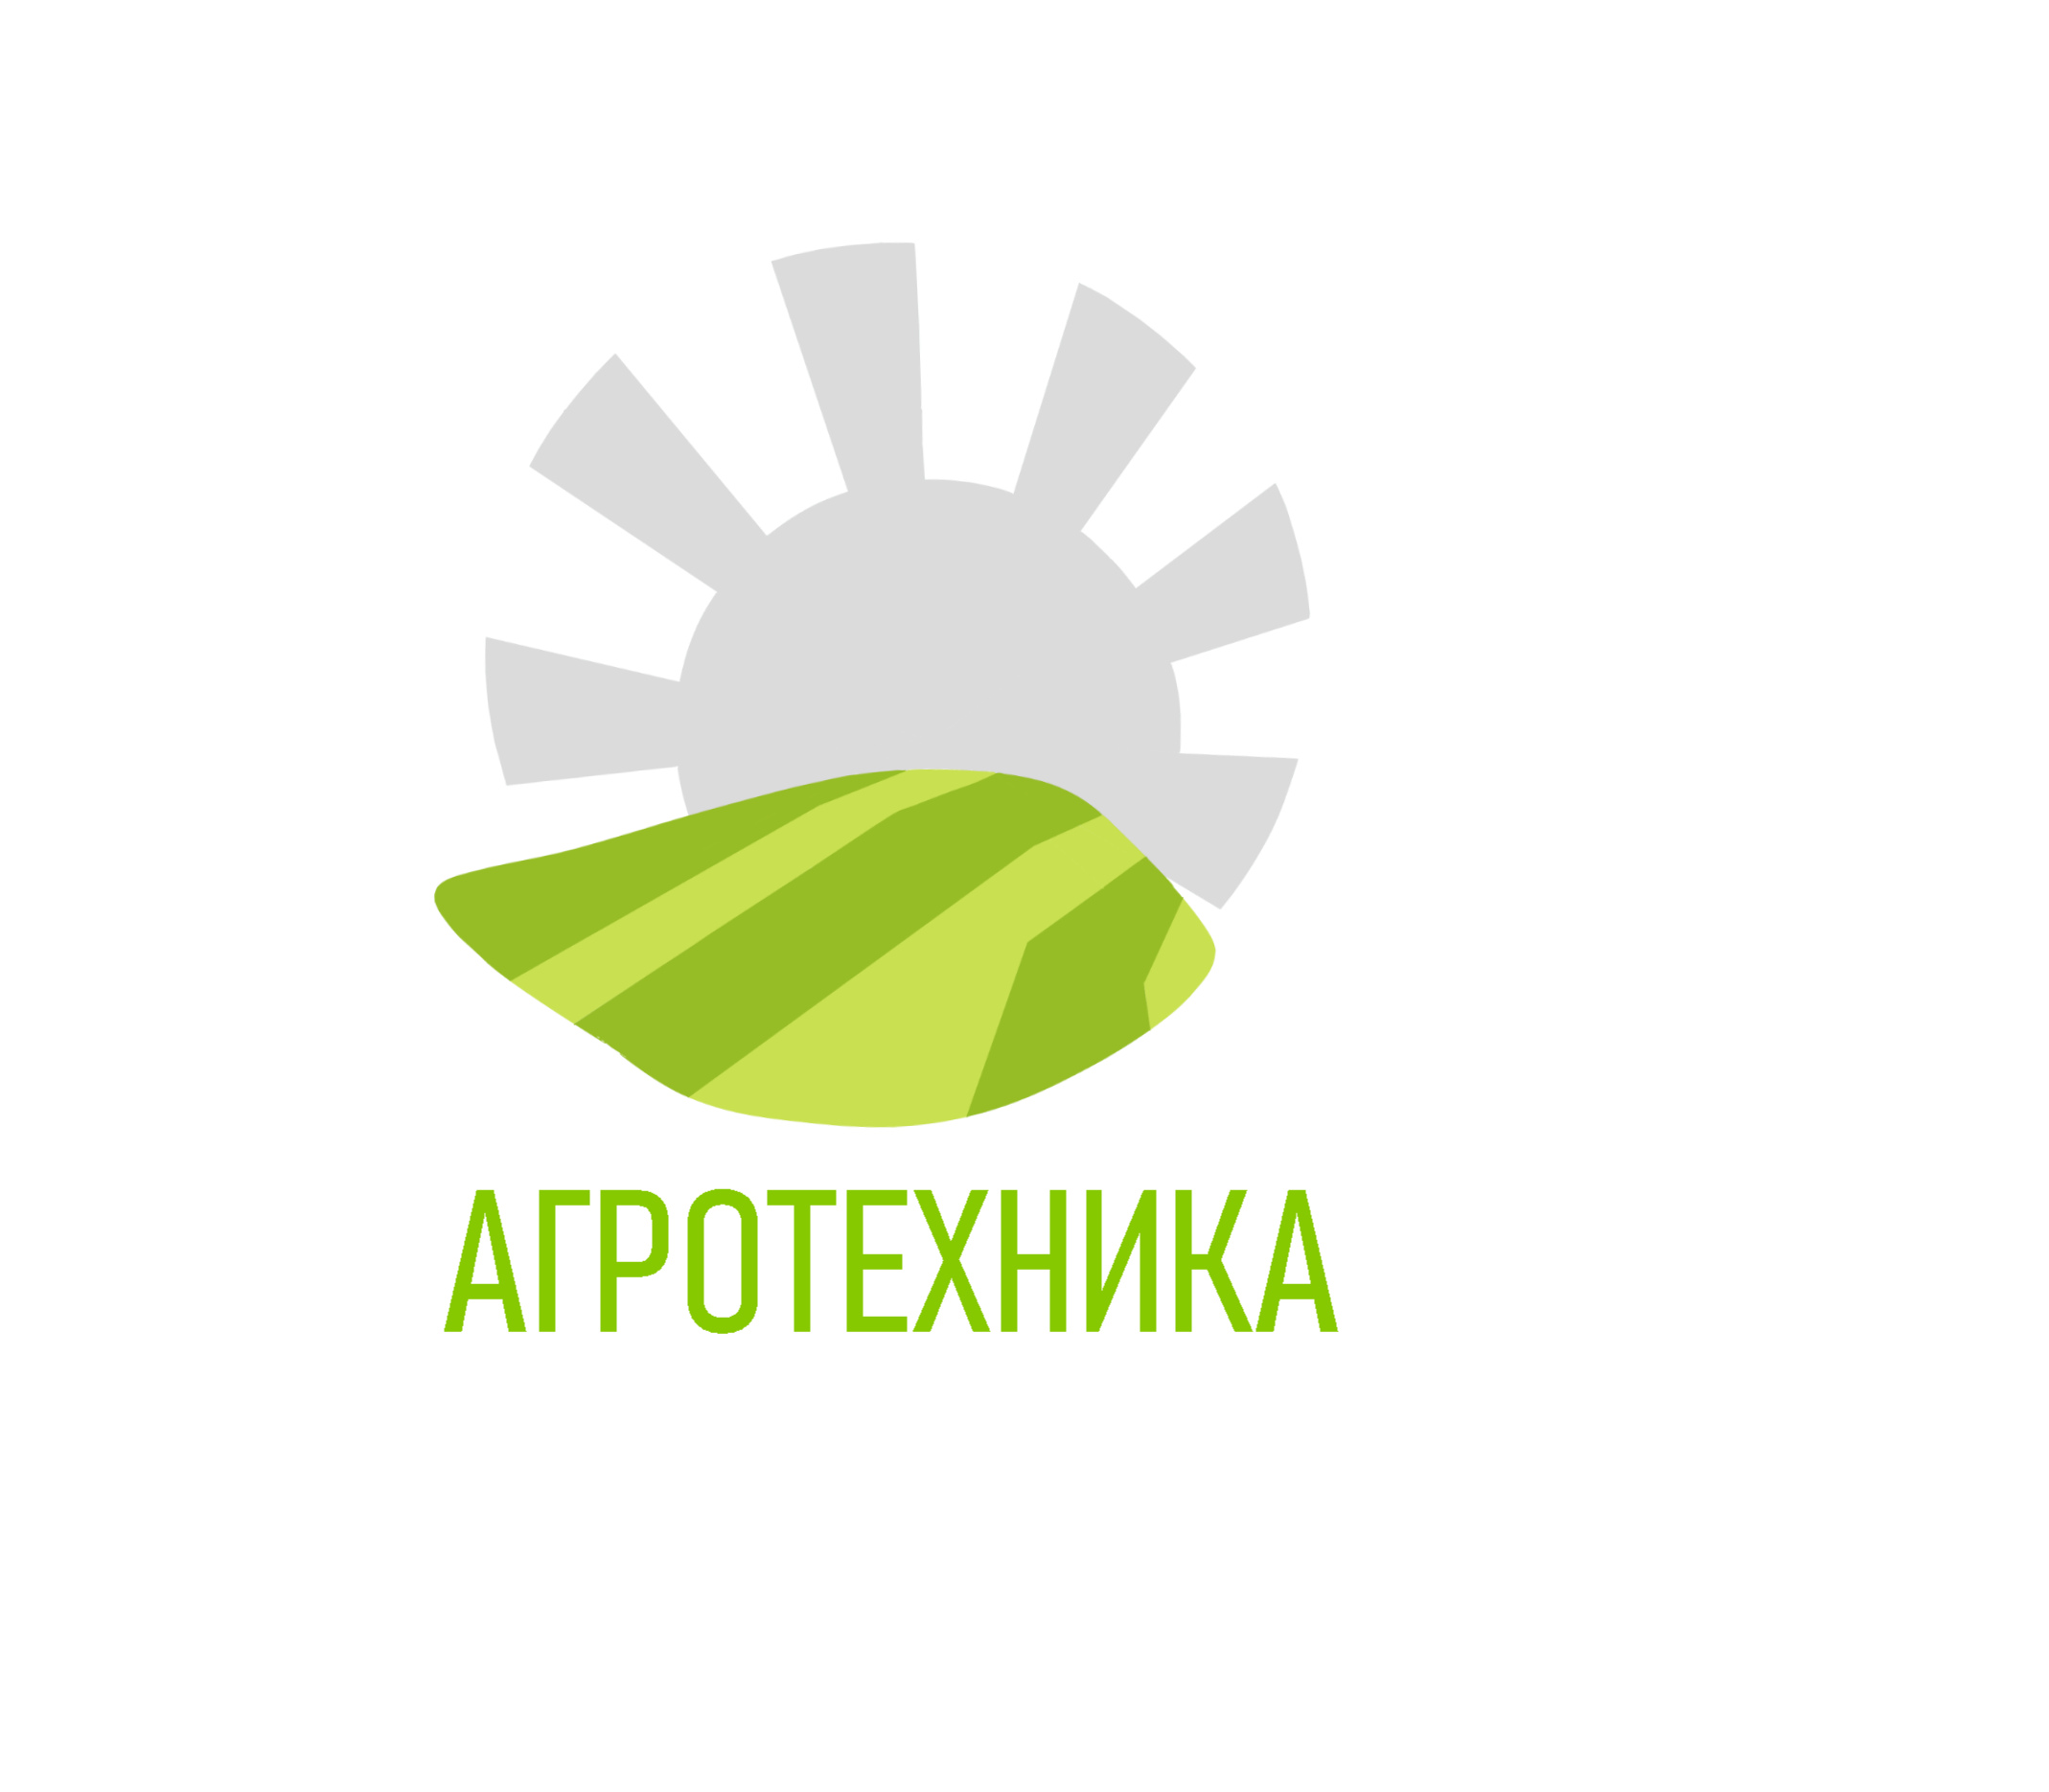 Разработка логотипа для компании Агротехника фото f_8955c067adae5a79.jpg